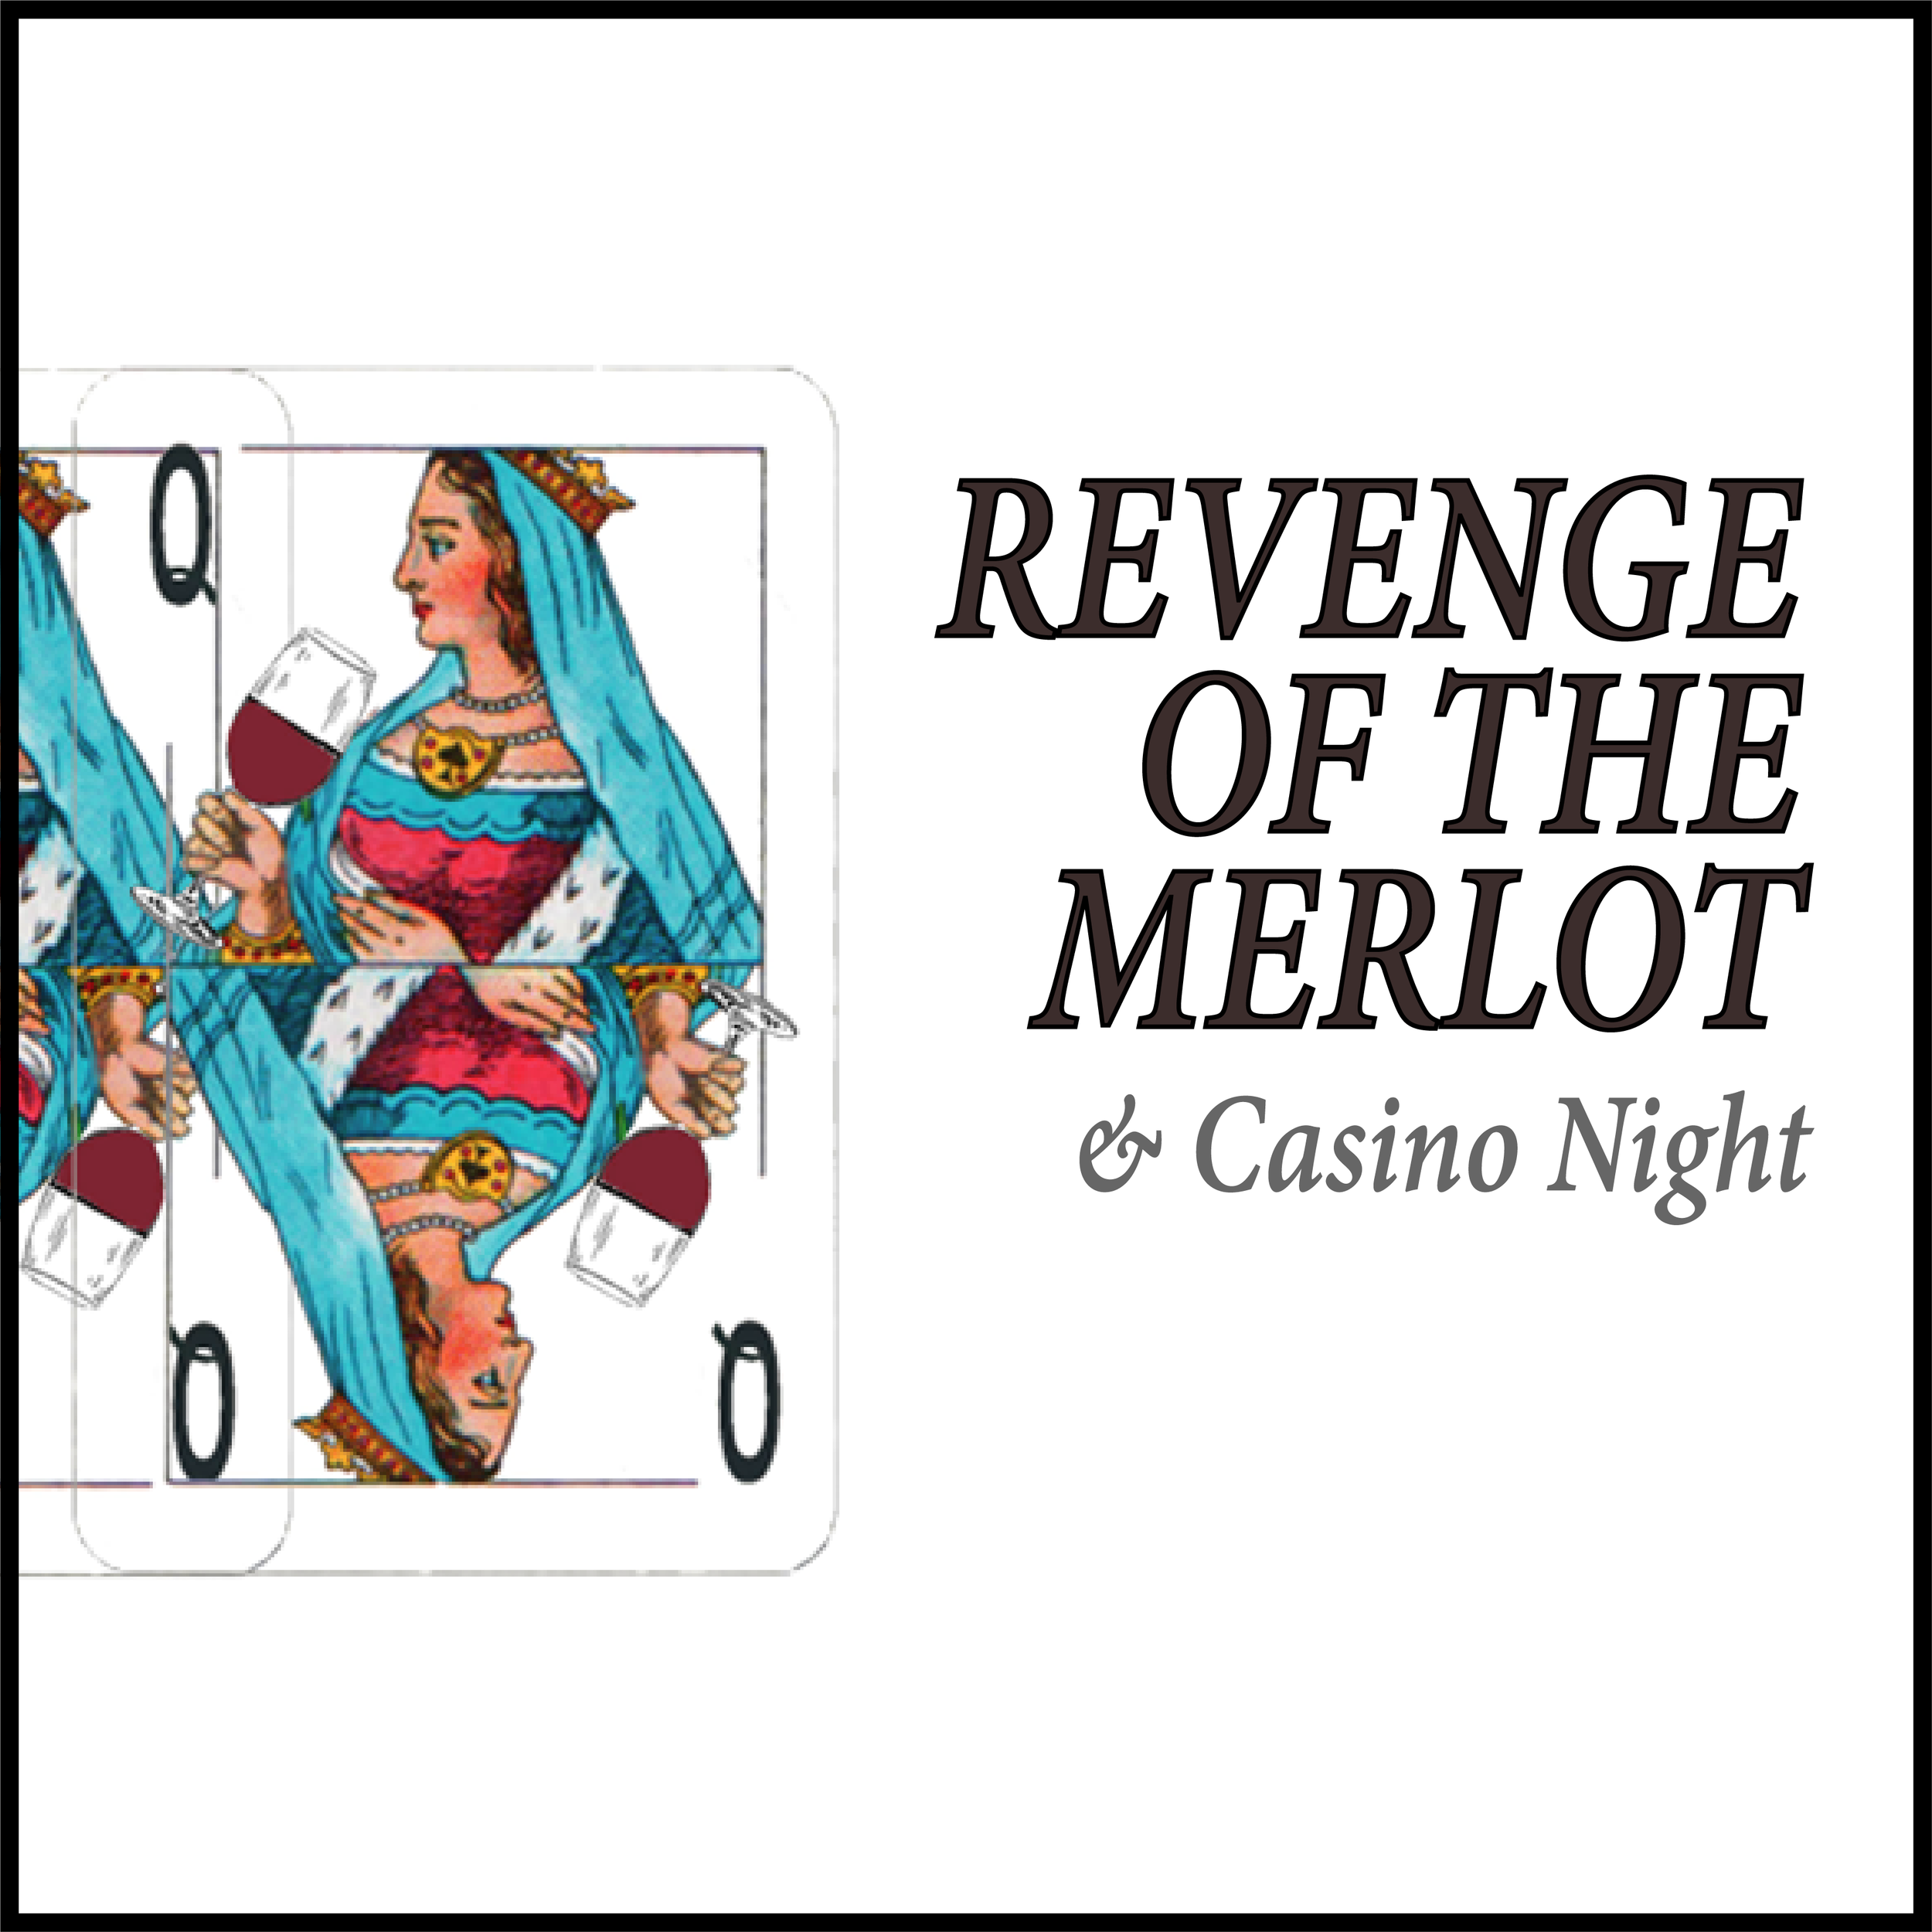 Revenge of The Merlot & Casino Night La Brea Bakery Café October 2, 2019 6:00 PM - 9:00 PM